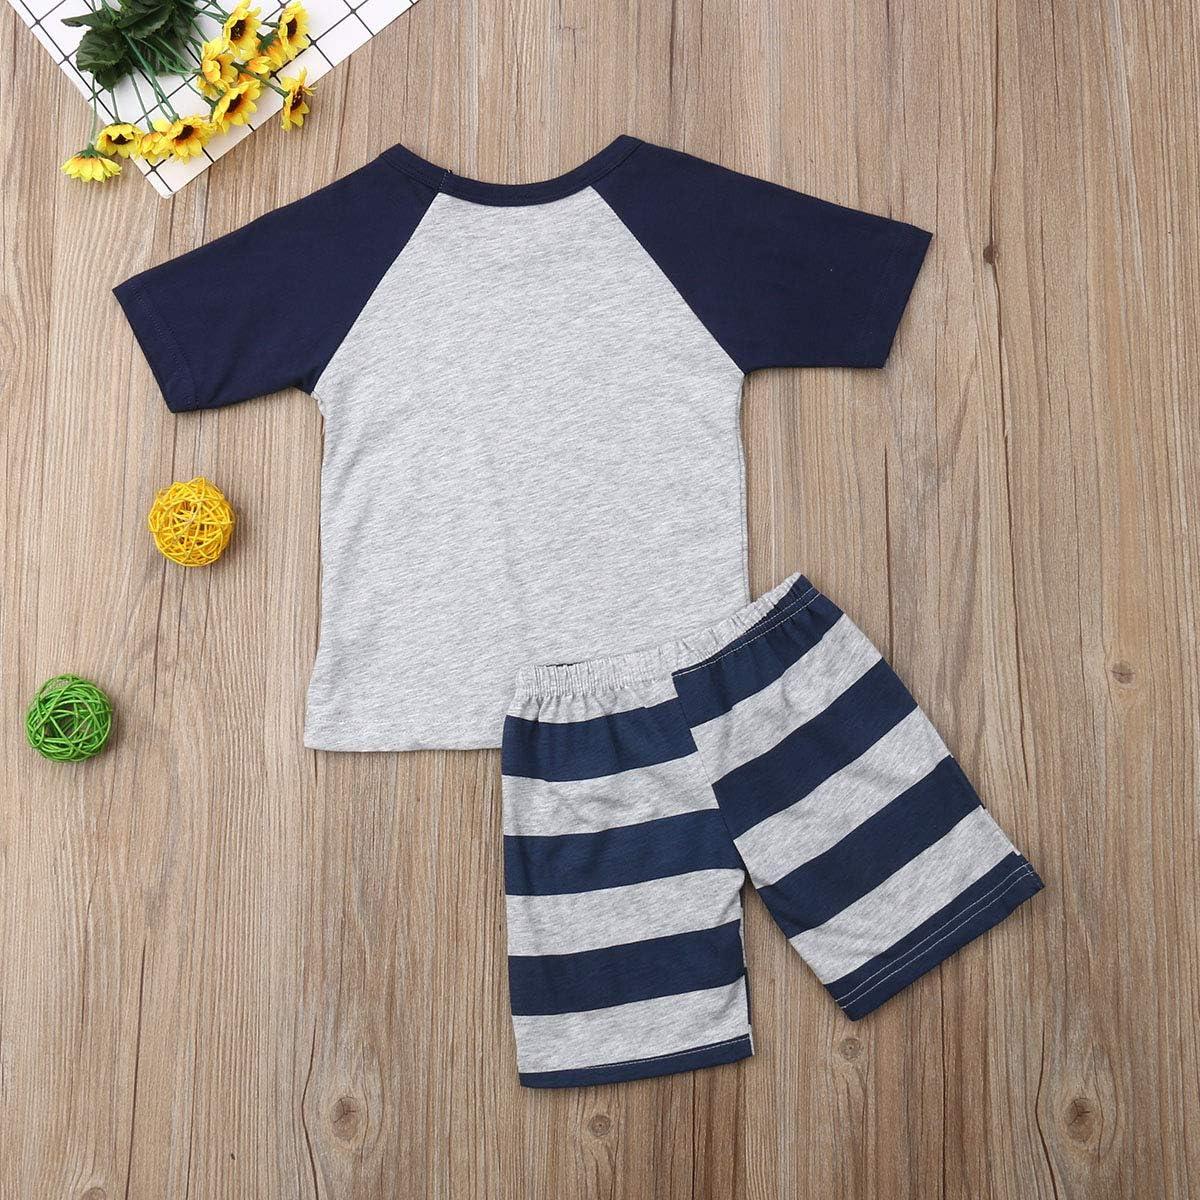 2Pcs Toddler Boy Dinosaur Short Sleeve Grey Splice Tee Top Stripe Shorts Set Summer Outfits